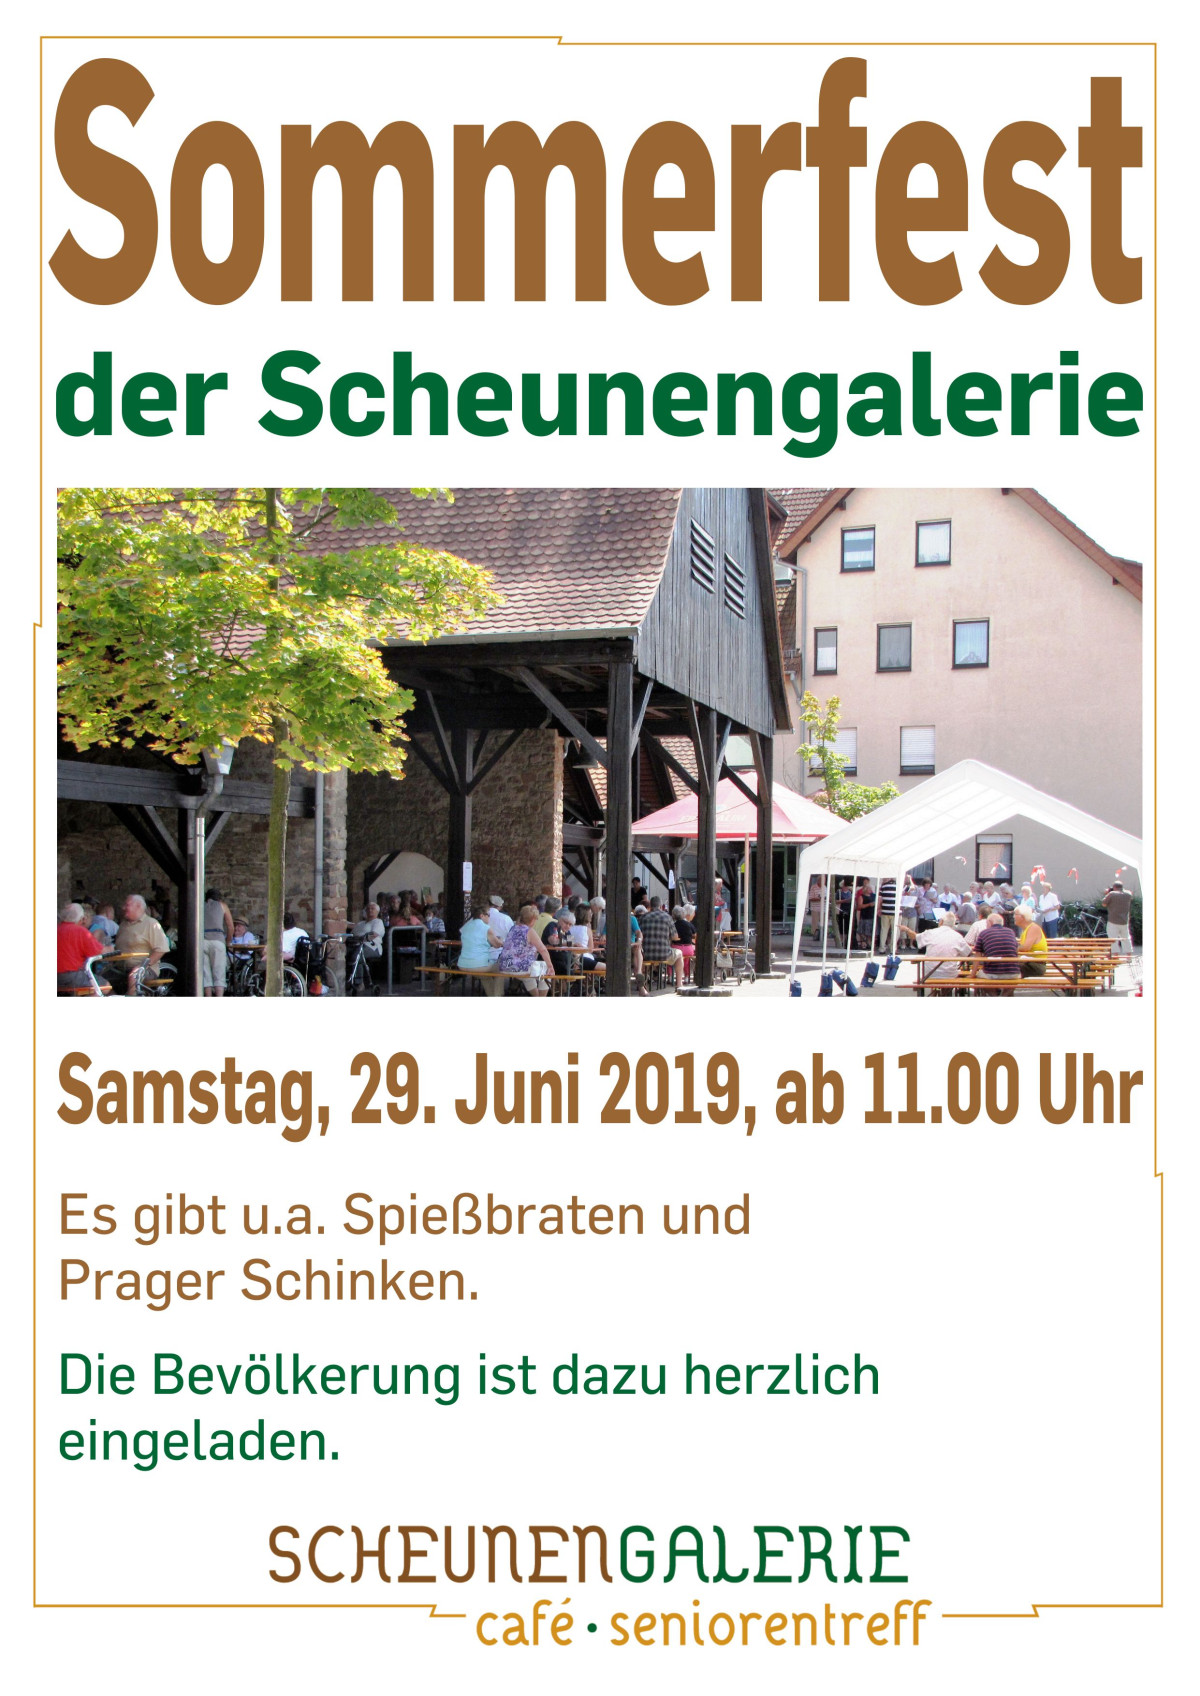 Scheunenfest